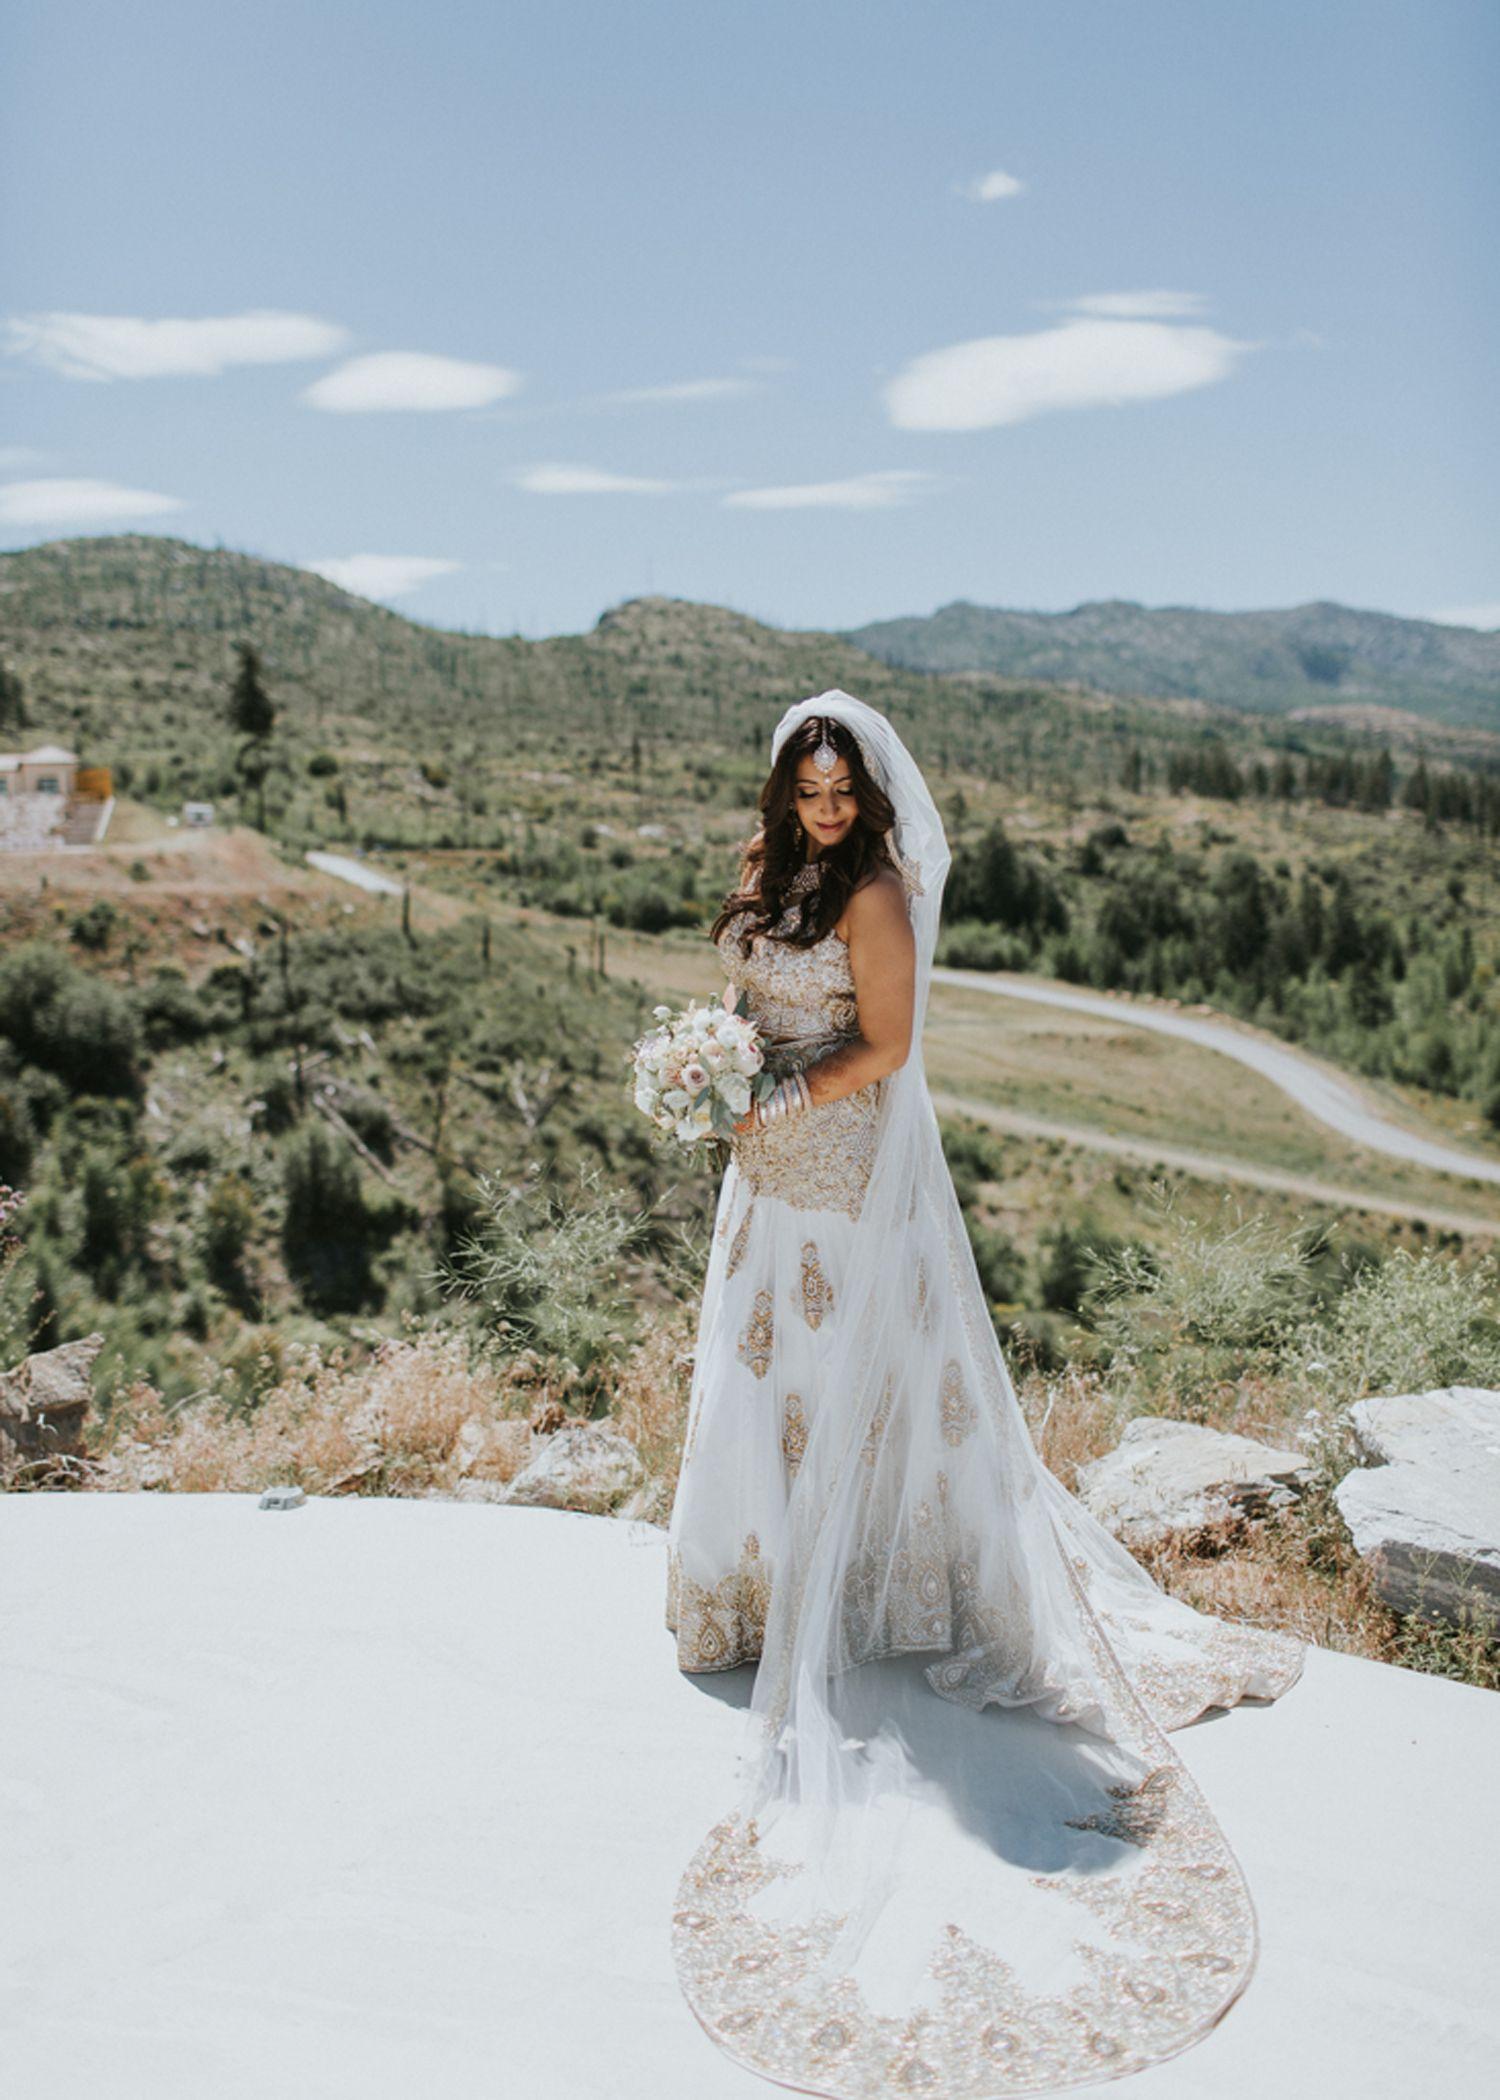 Cultures Unite At A Fusion Wedding In Kelowna Kelowna Wedding Okanagan Wedding Long Beach Wedding Dresses Bridal Gowns Mermaid Wedding Dresses